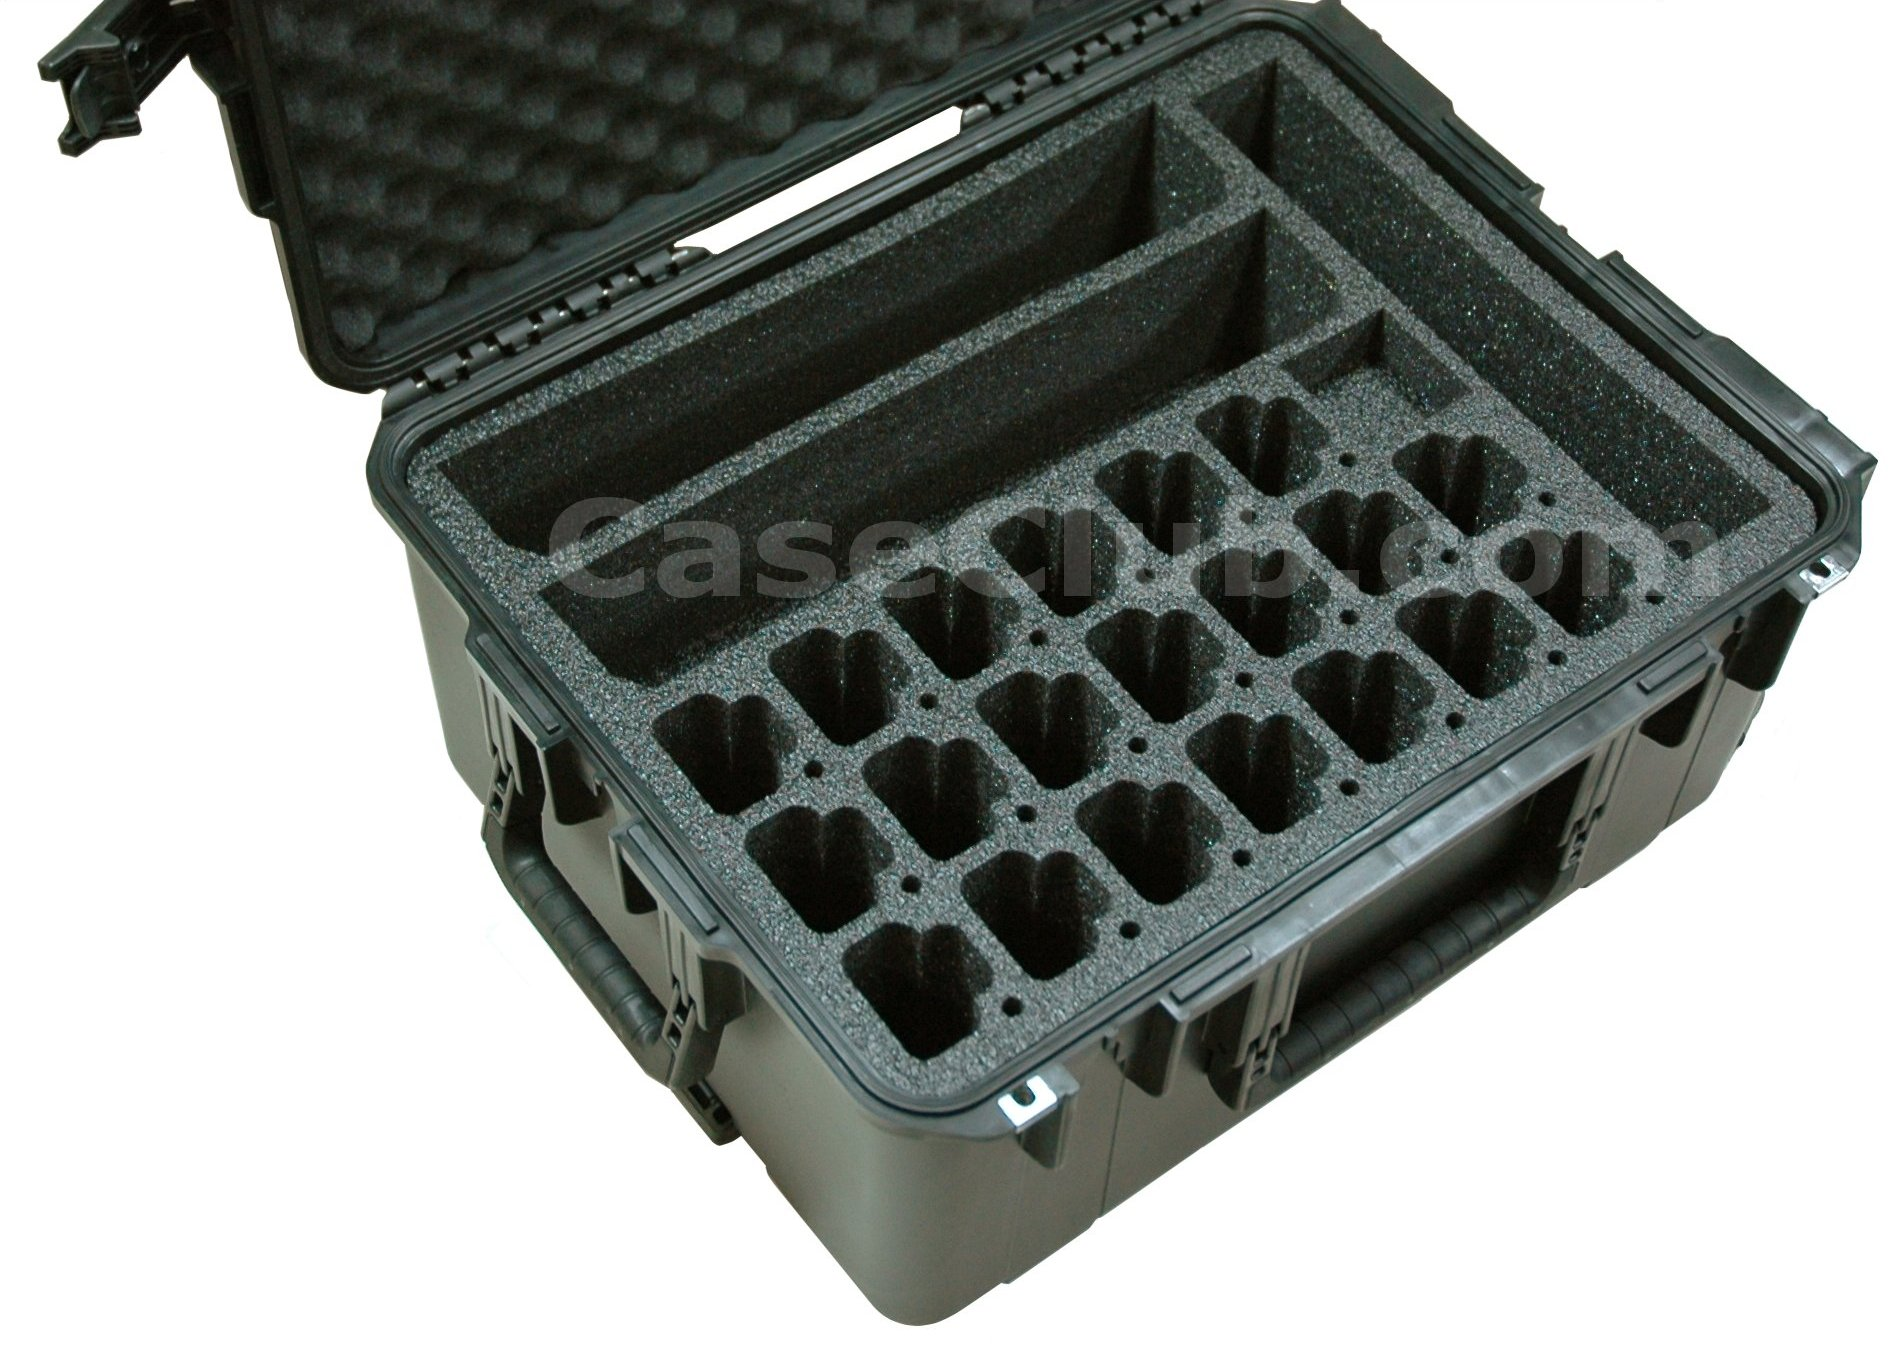 SKB 3I-2217-10 Case Custom Foam Example: Qty 20 Motorola CP200 Radio, 2 Charging Banks